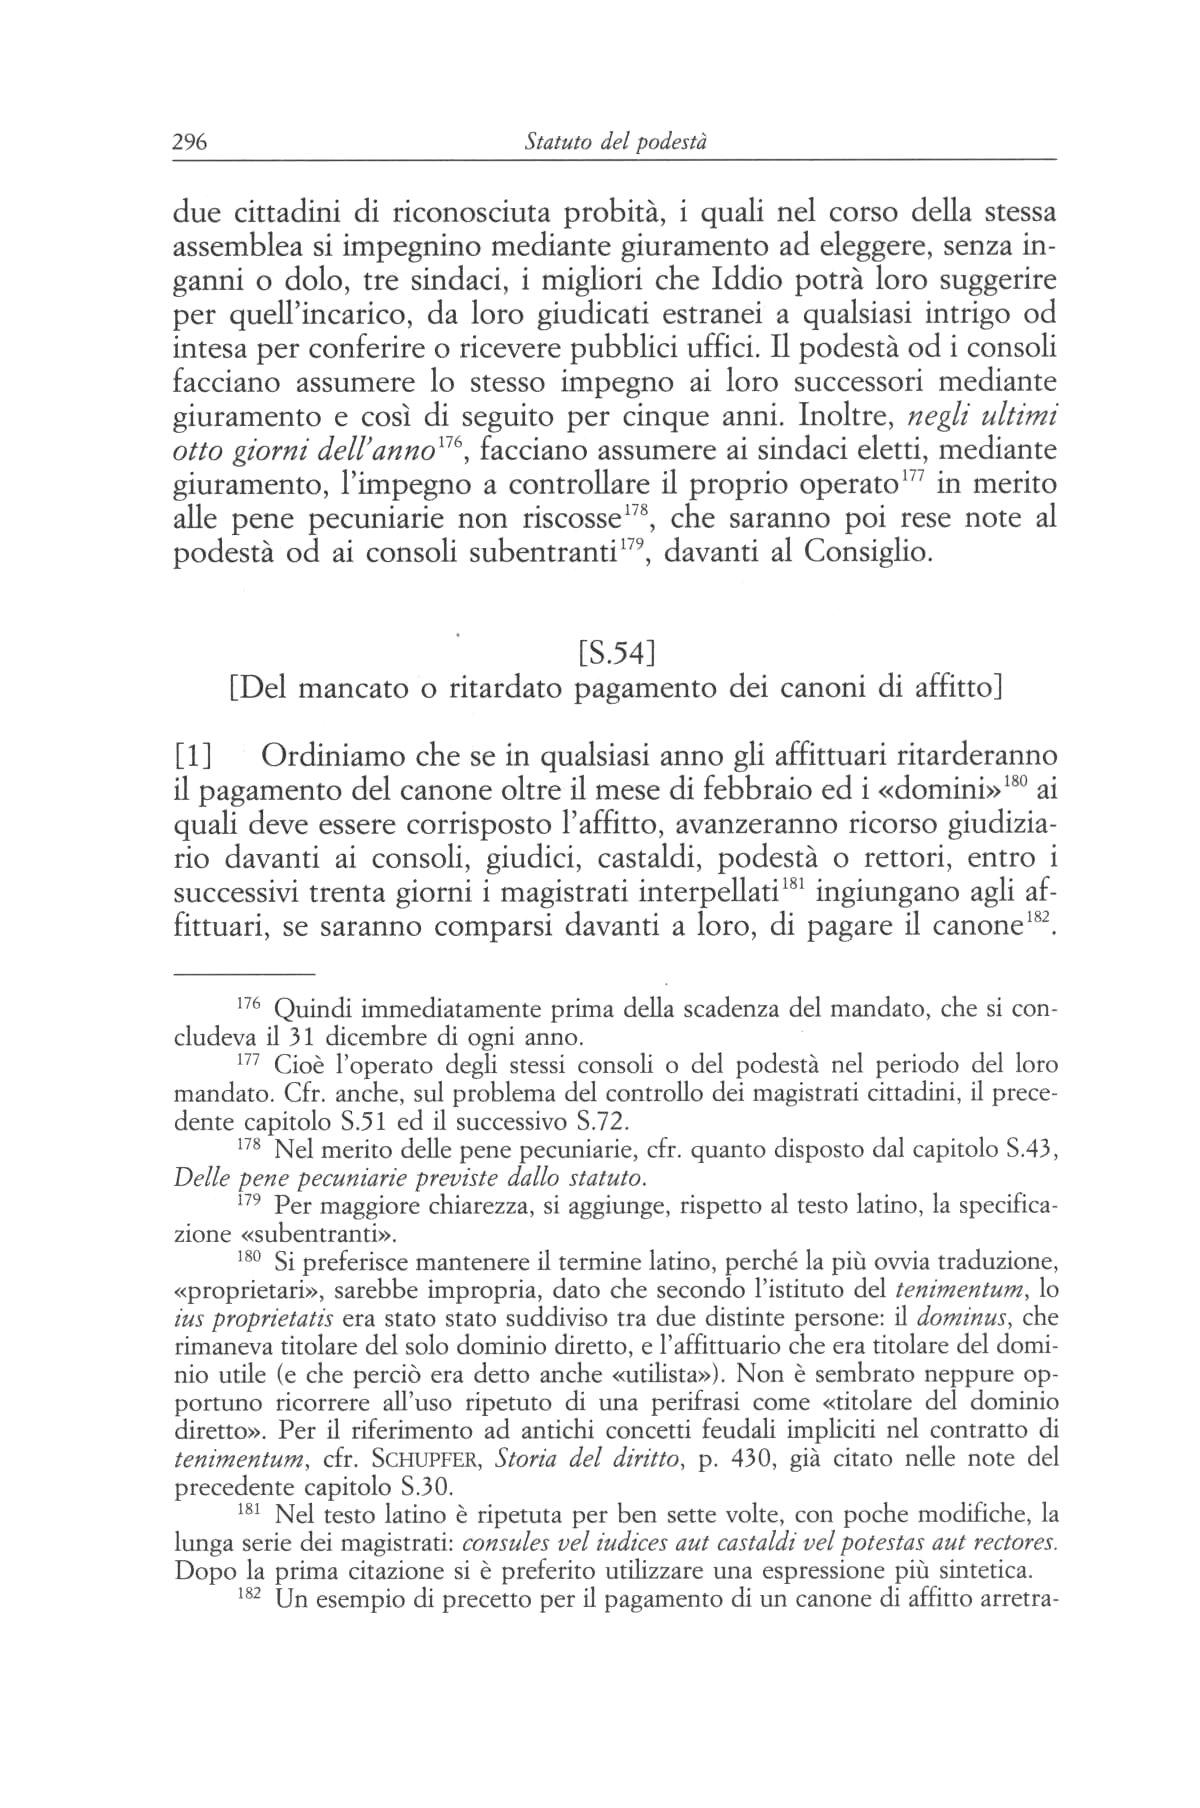 statuti pistoiesi del sec.XII 0296.jpg